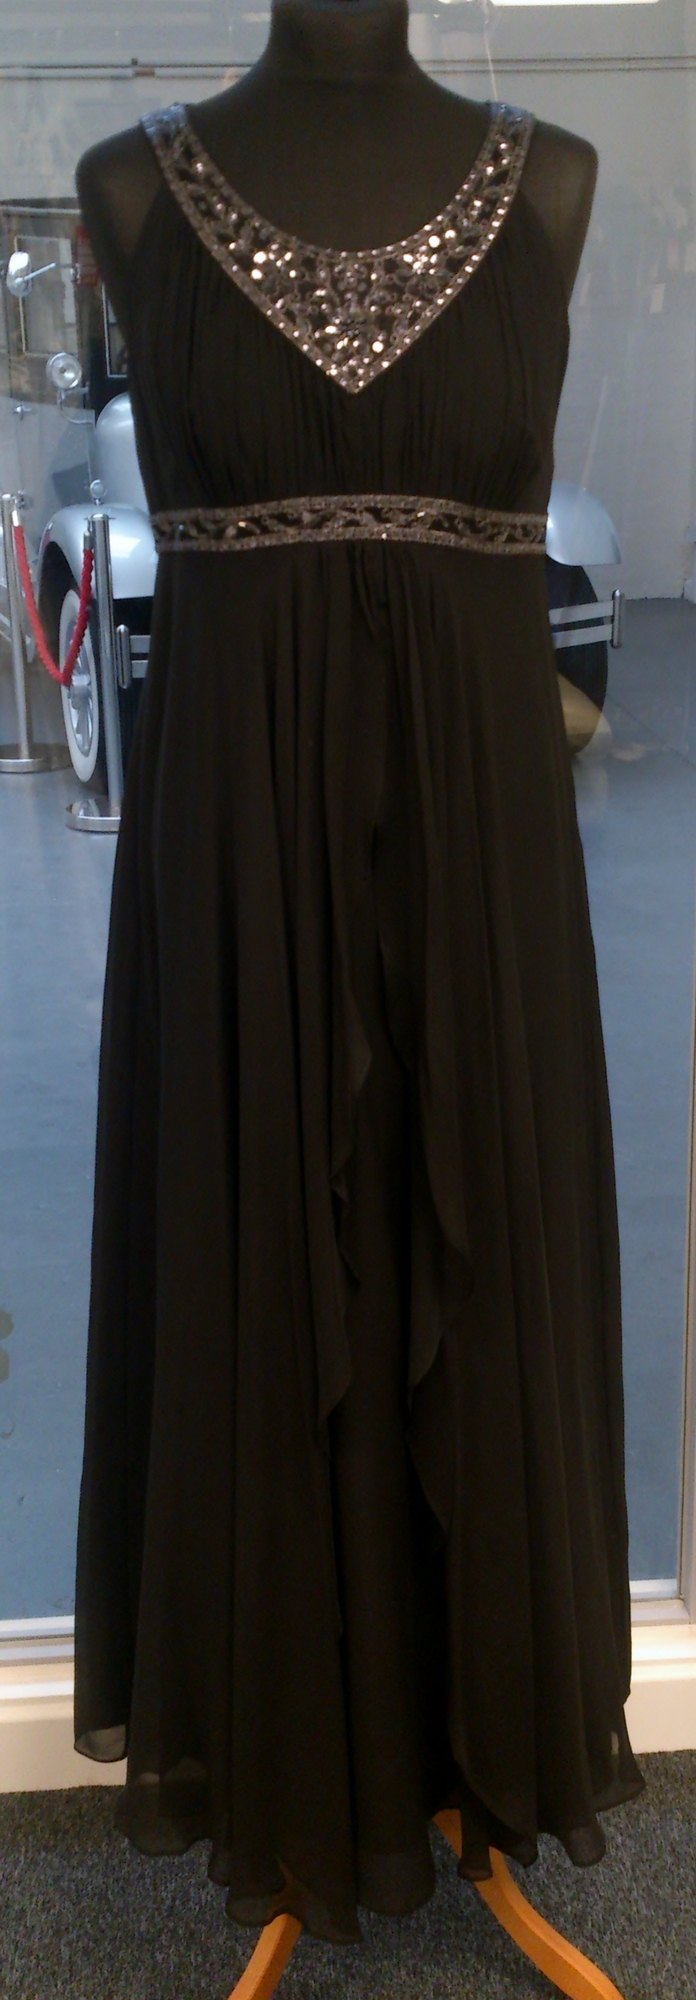 Monsoon Black Evening Maxi Dress - Size 12